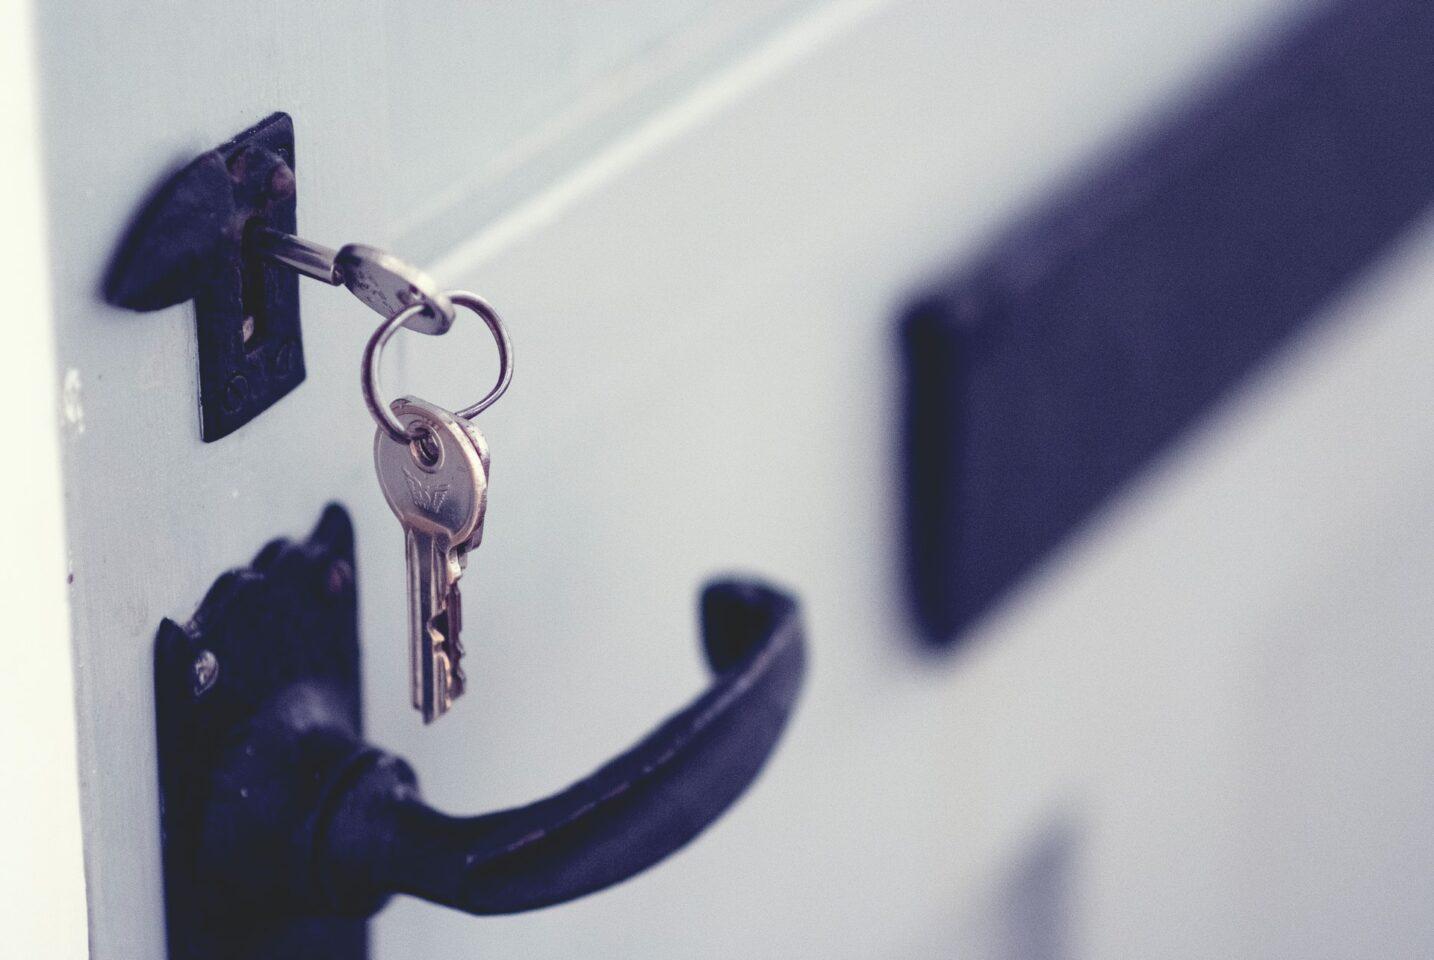 key inside a door